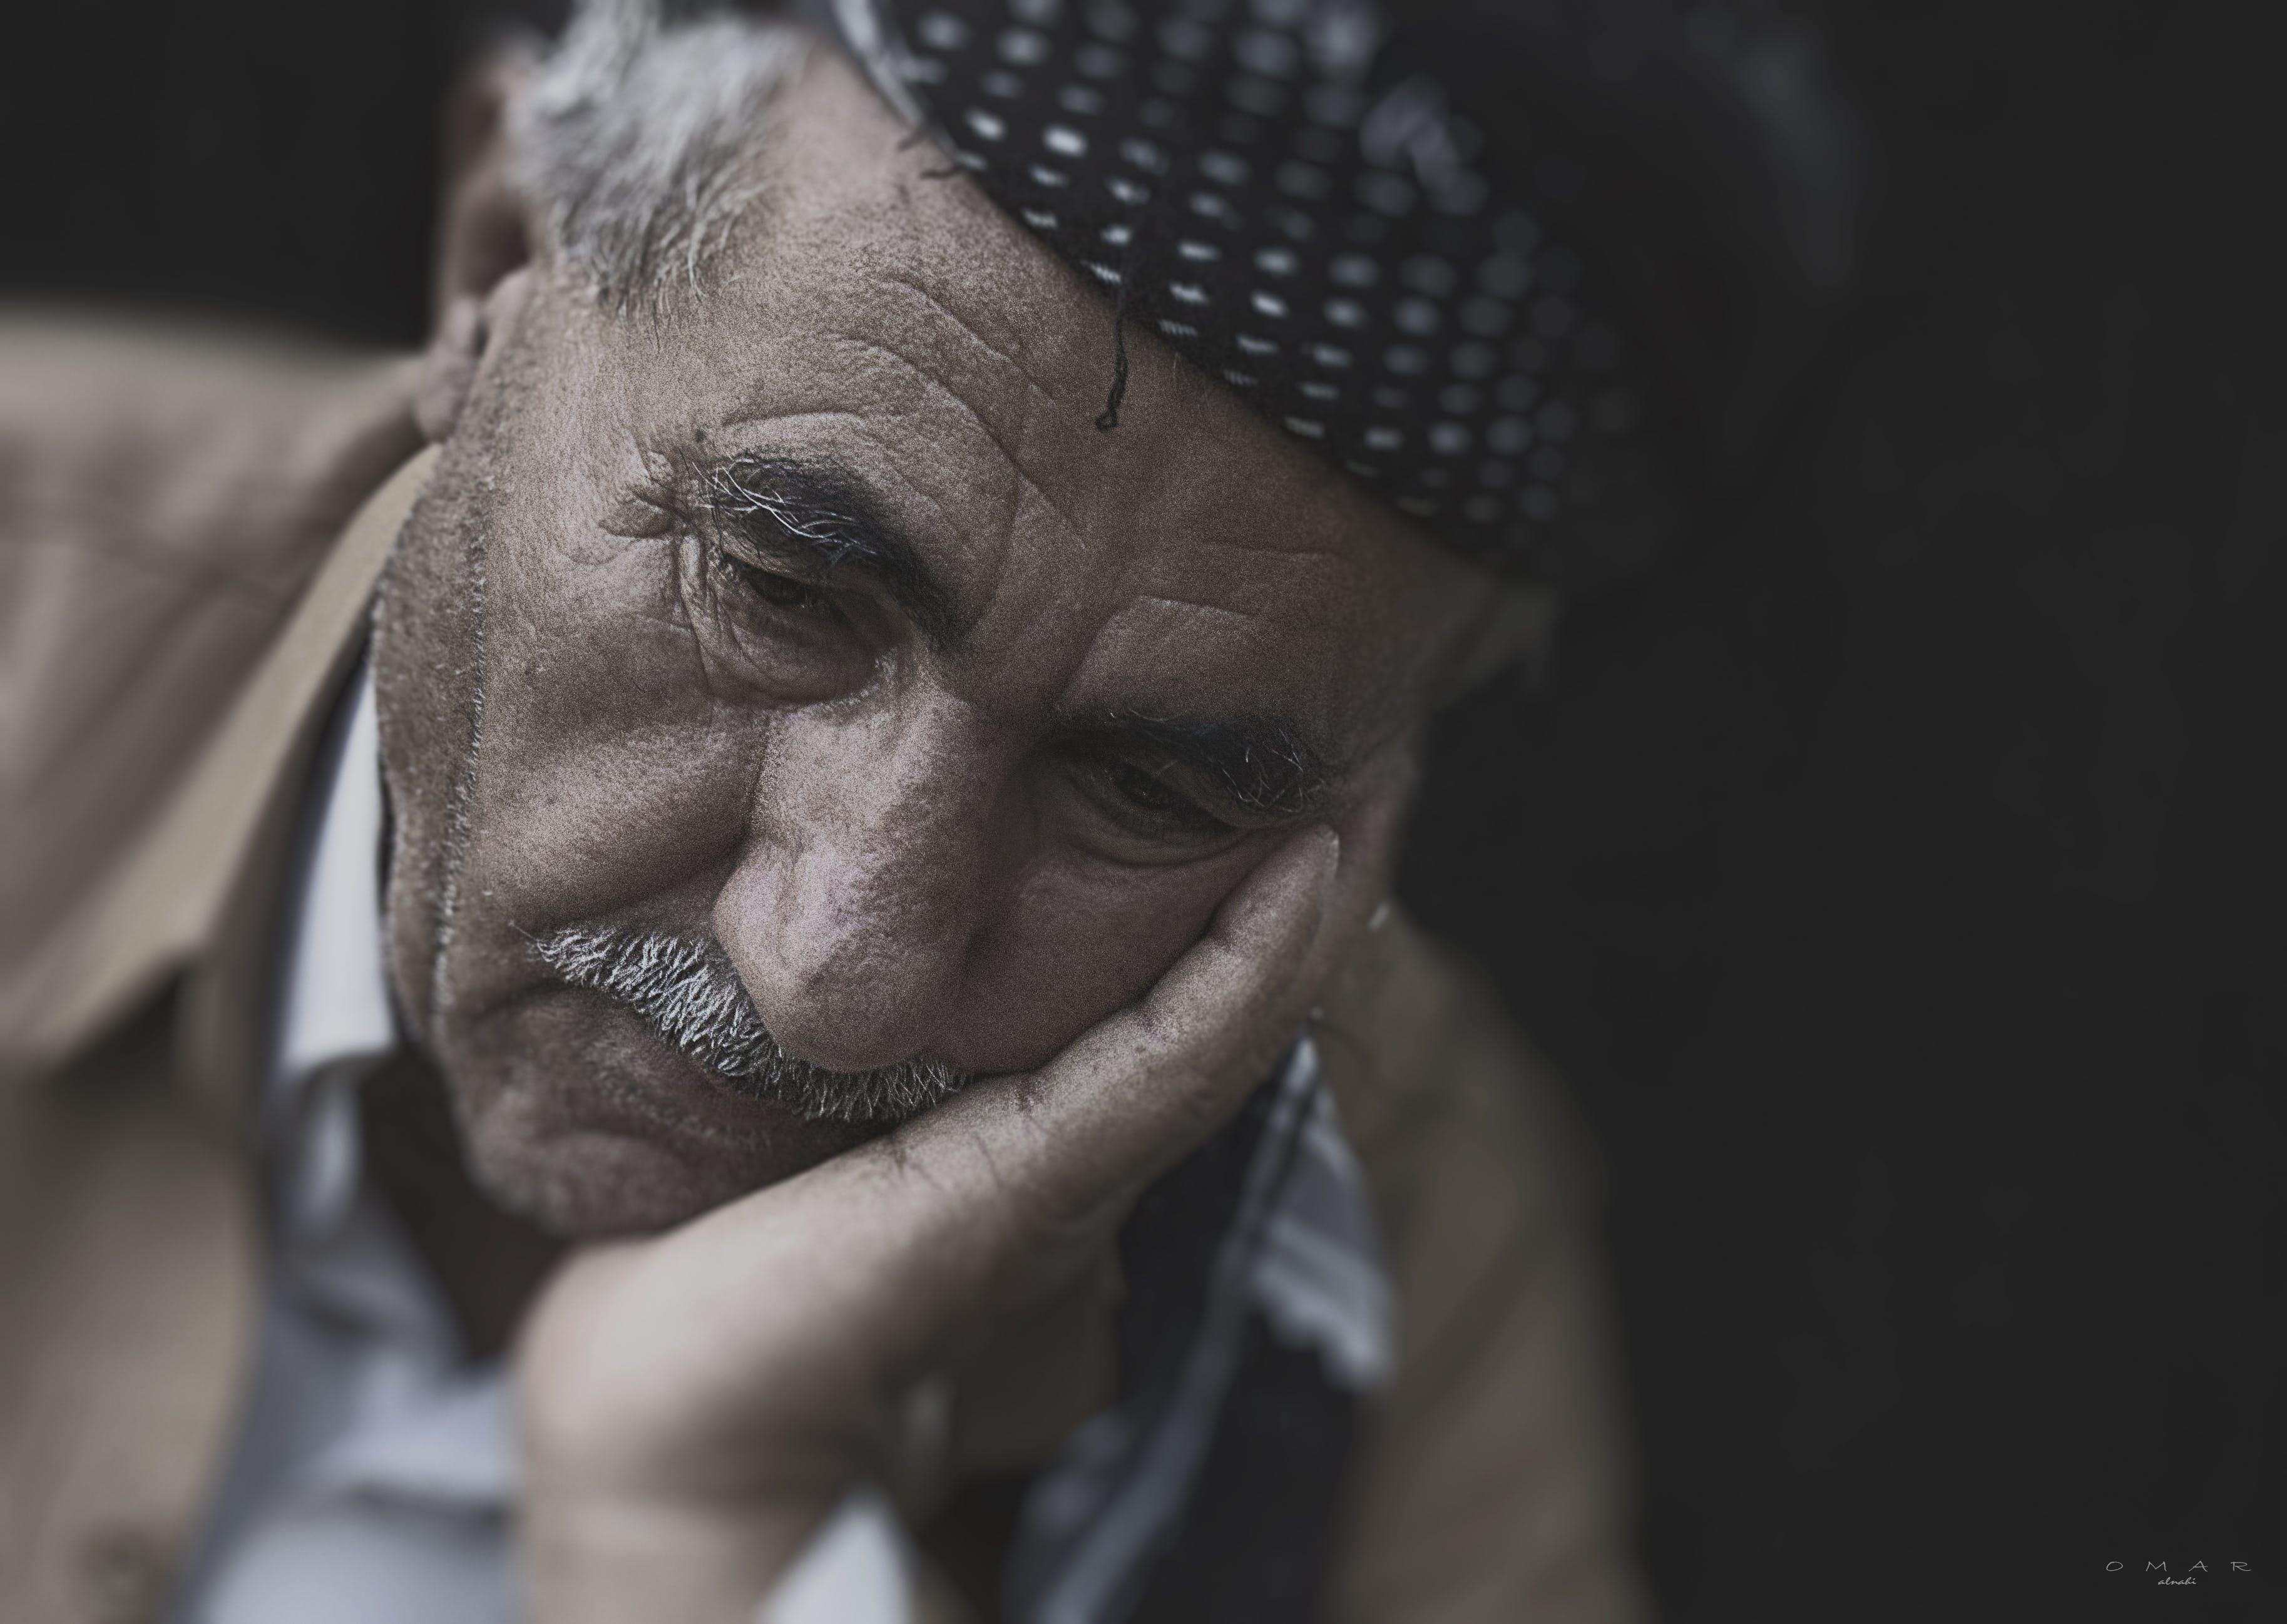 Alter Mann grübelt | Quelle: Pexels